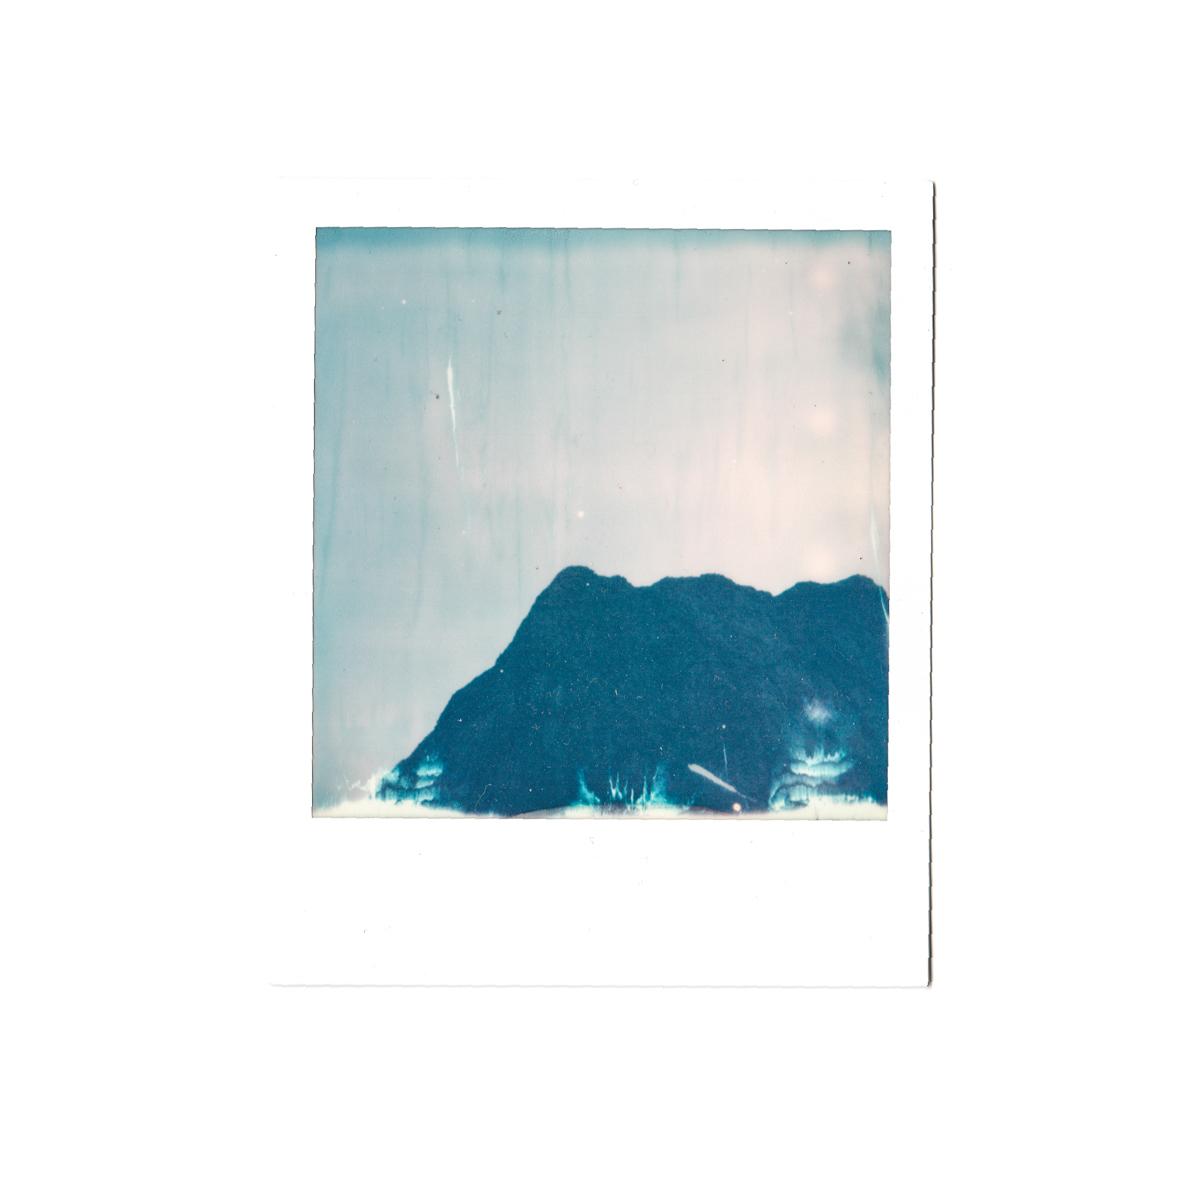 Magnolia_mountain_solvor_MT34-1.jpg